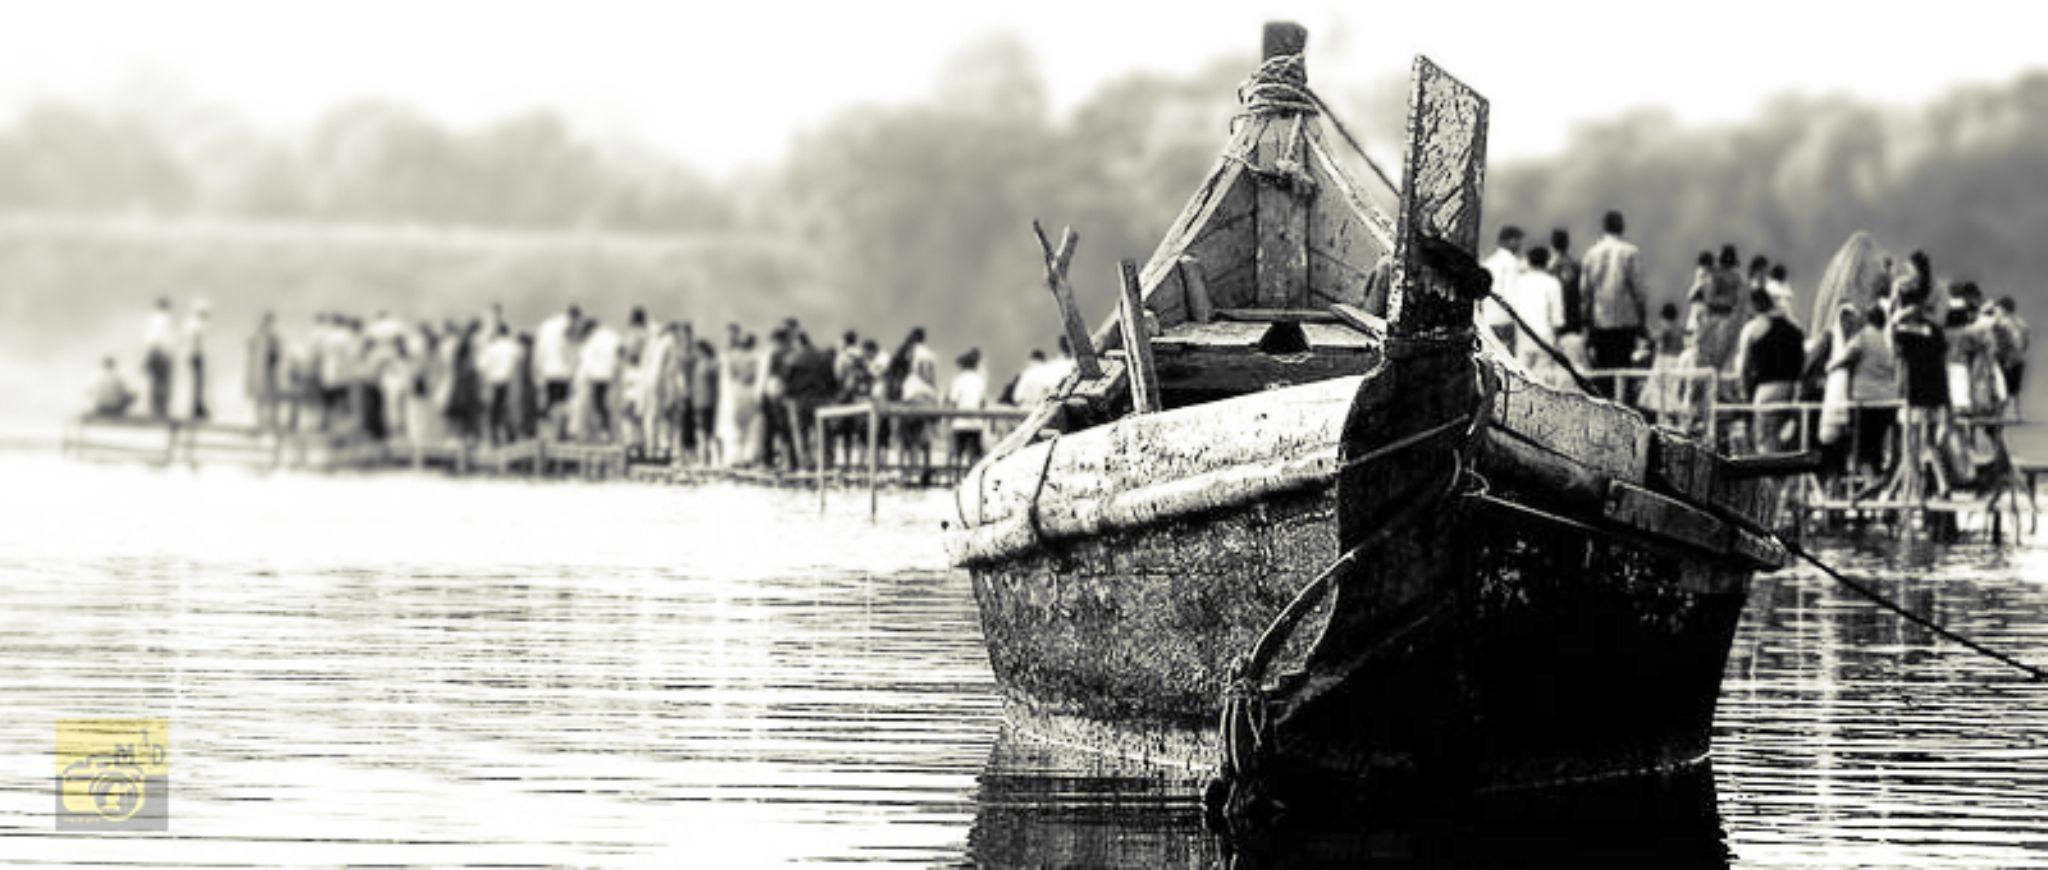 Noah by arindam dhar